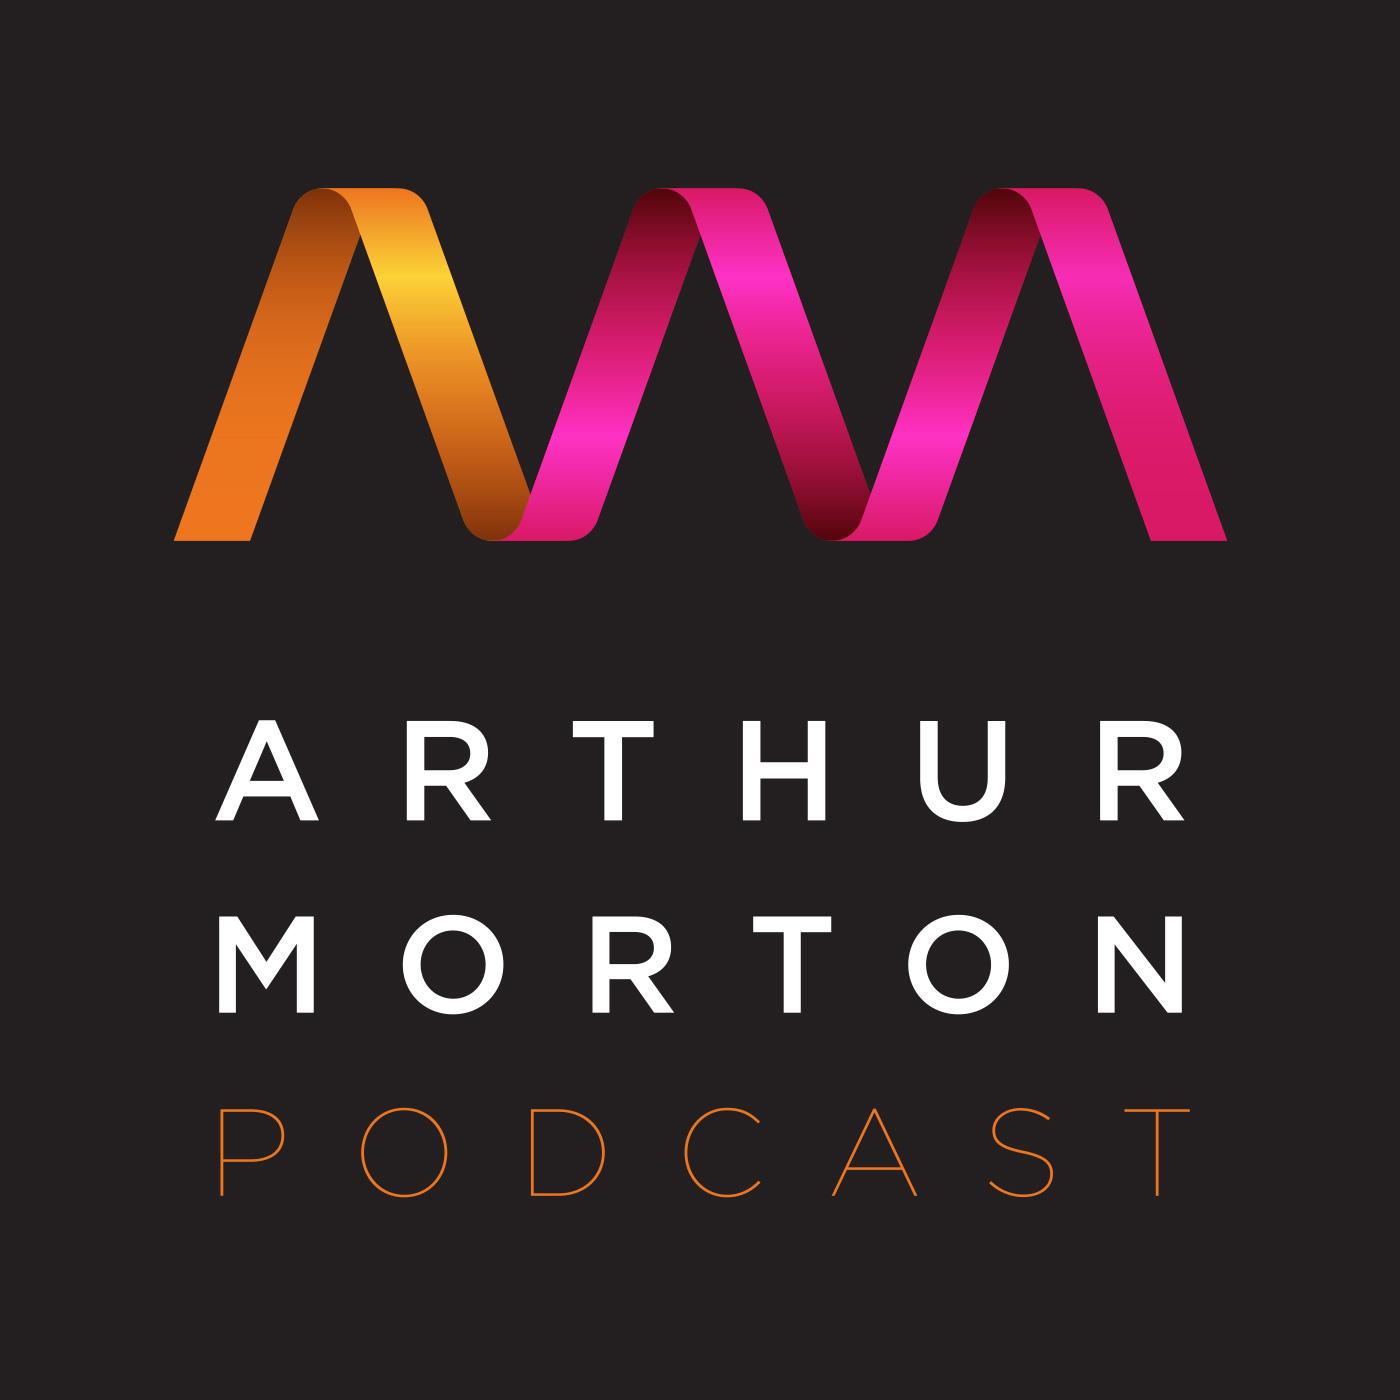 Arthur Morton Podcast